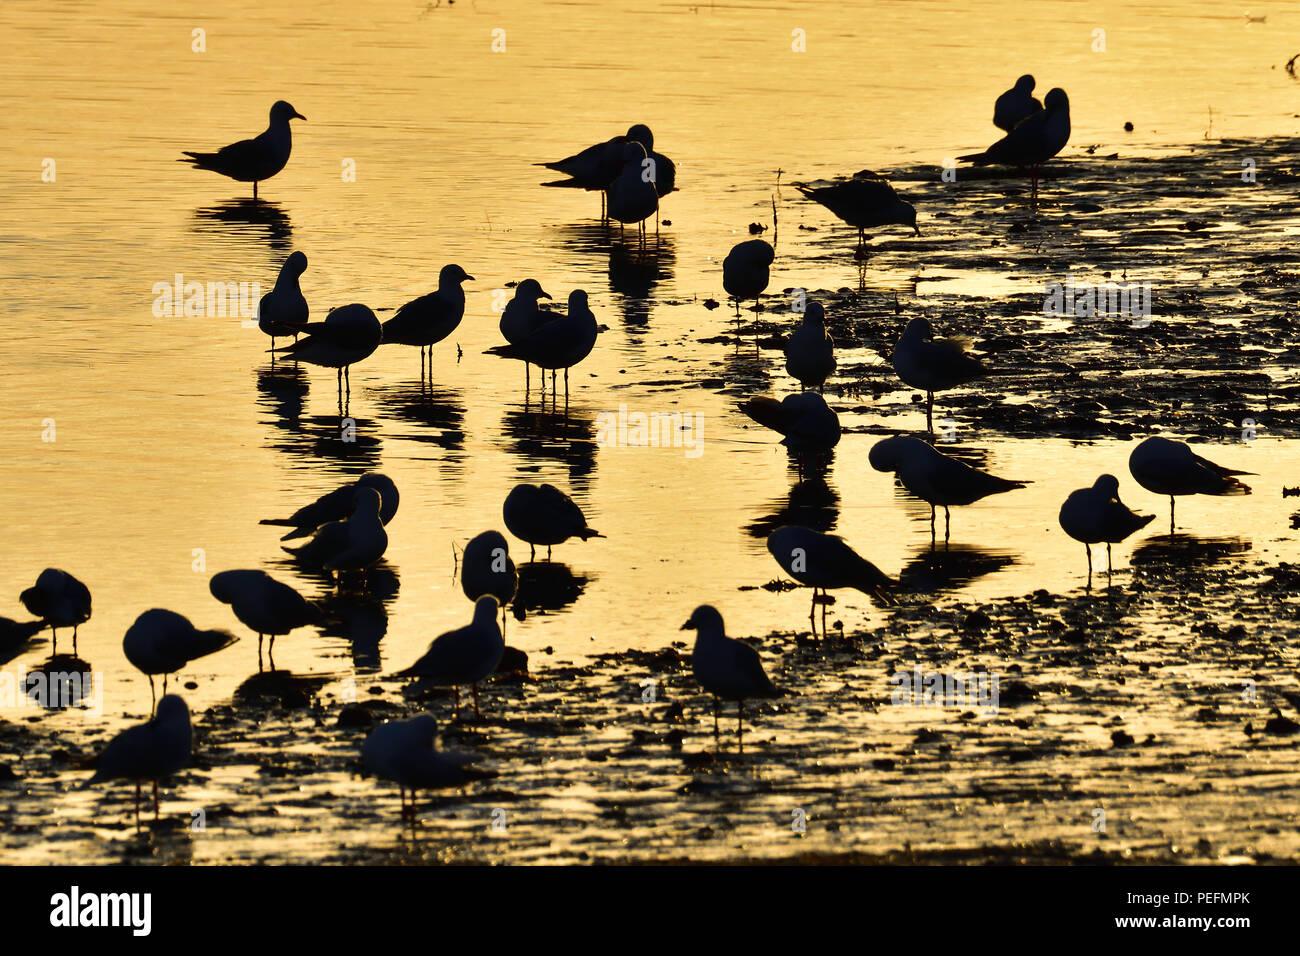 A flock of Australian, Queensland Silver Gulls ( Larus novaehollandiae ) standing in low tide at sunrise - Stock Image